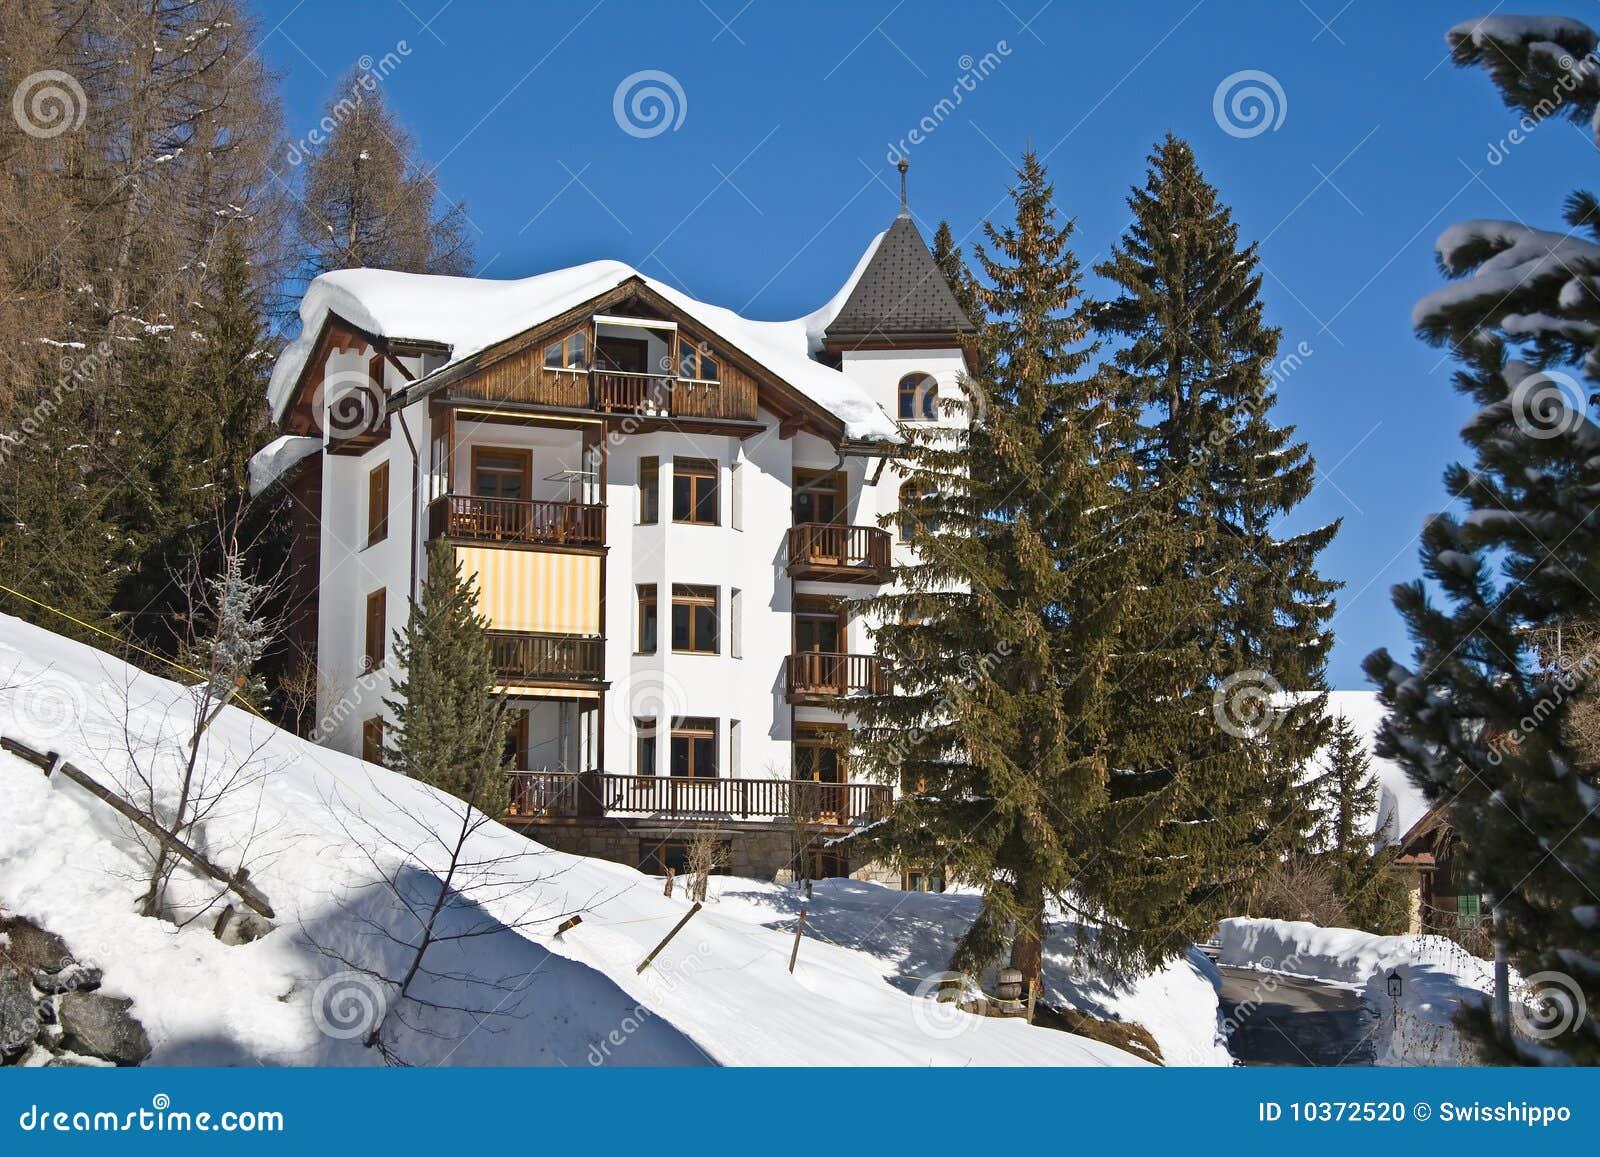 Winter Holiday House Stock Photo Image 10372520